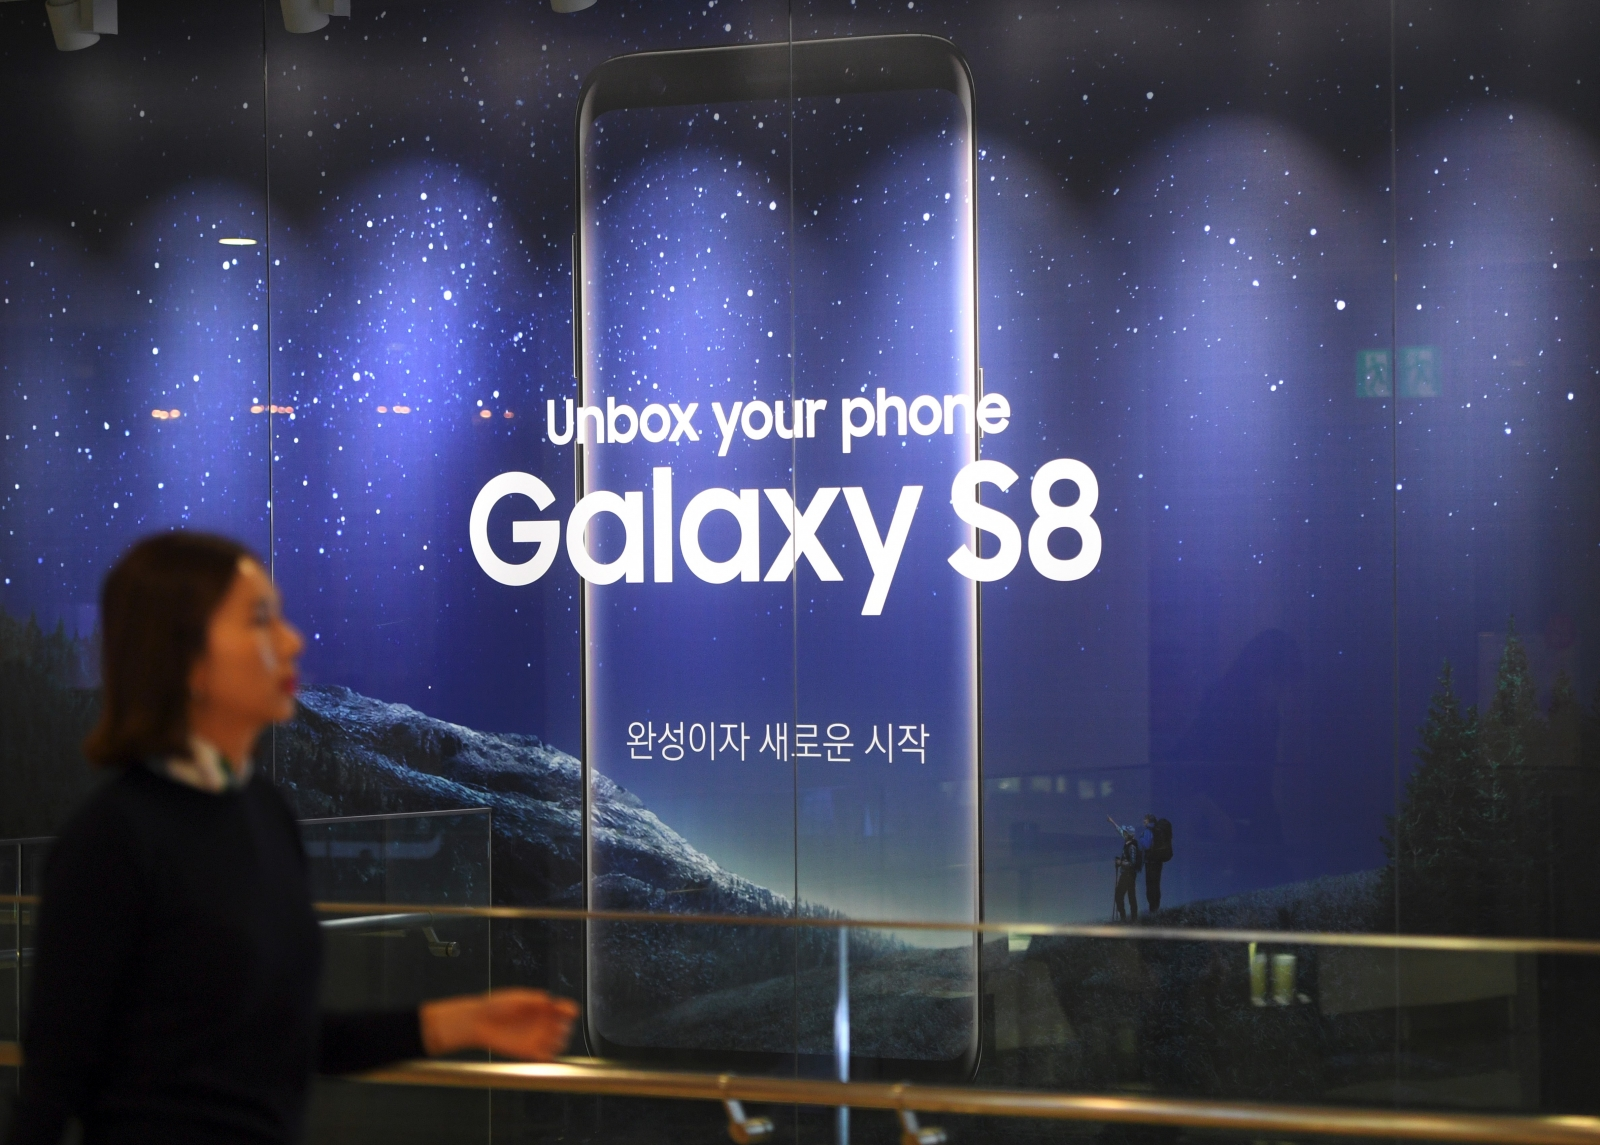 Galaxy S8 sold 1 million in SouthKorea